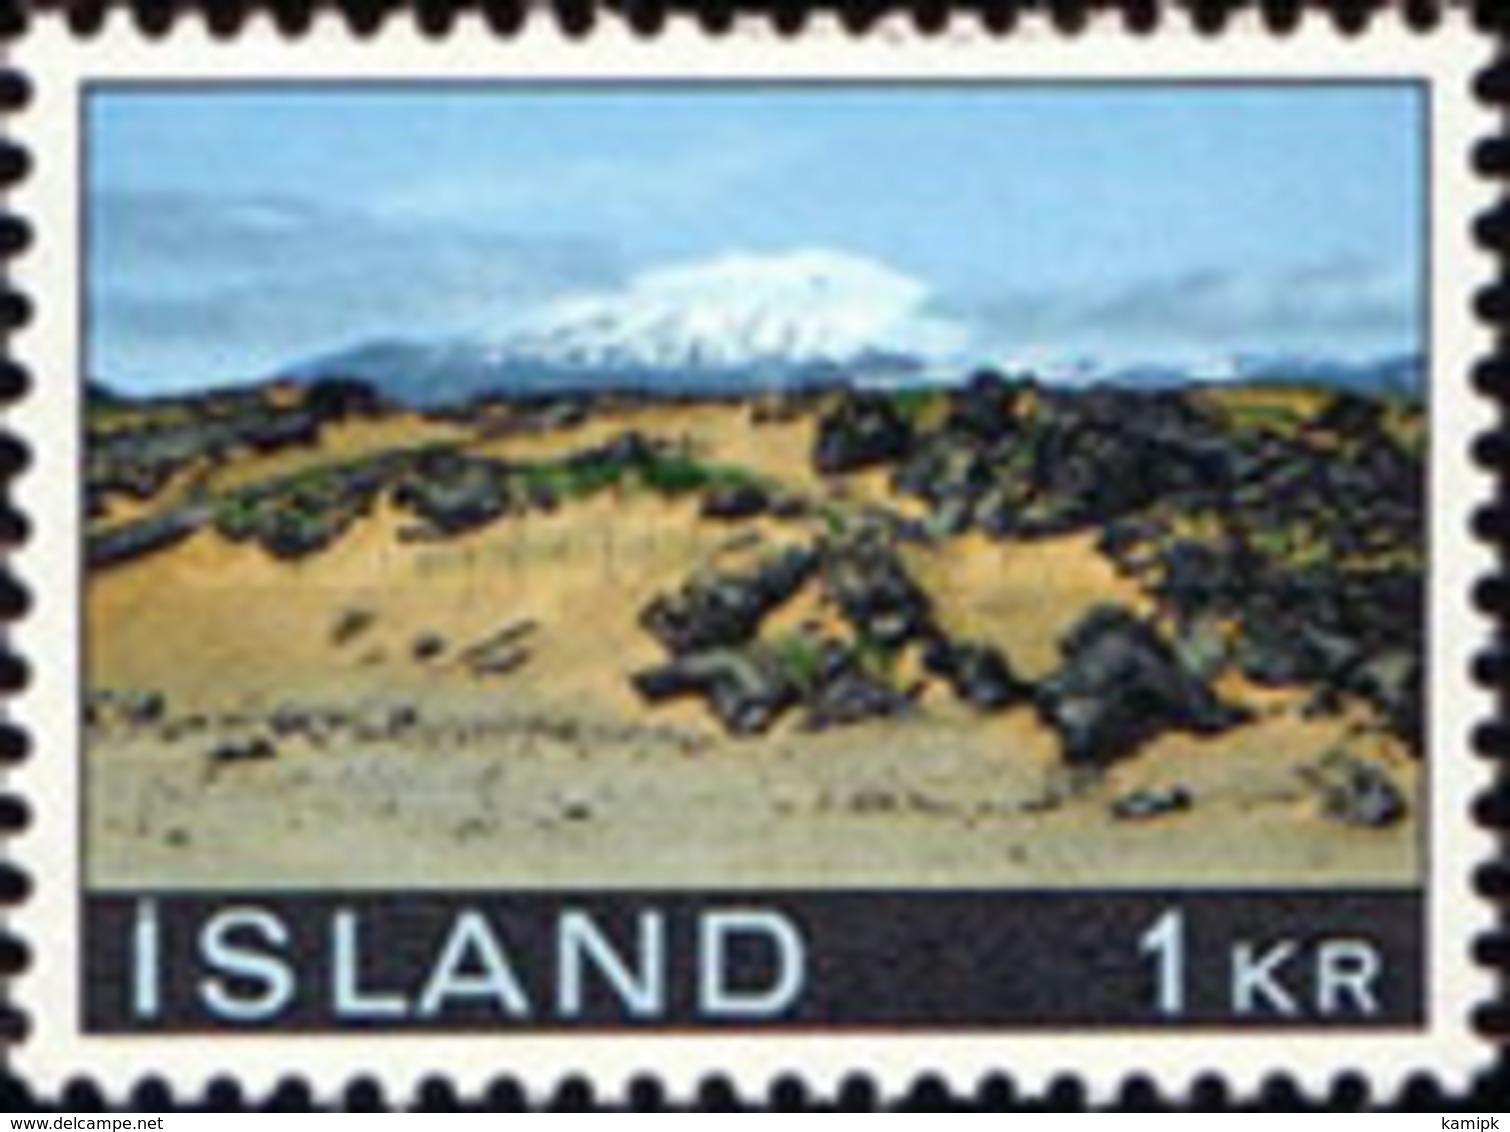 USED STAMPS Iceland - Landscapes - 1970 - Gebraucht